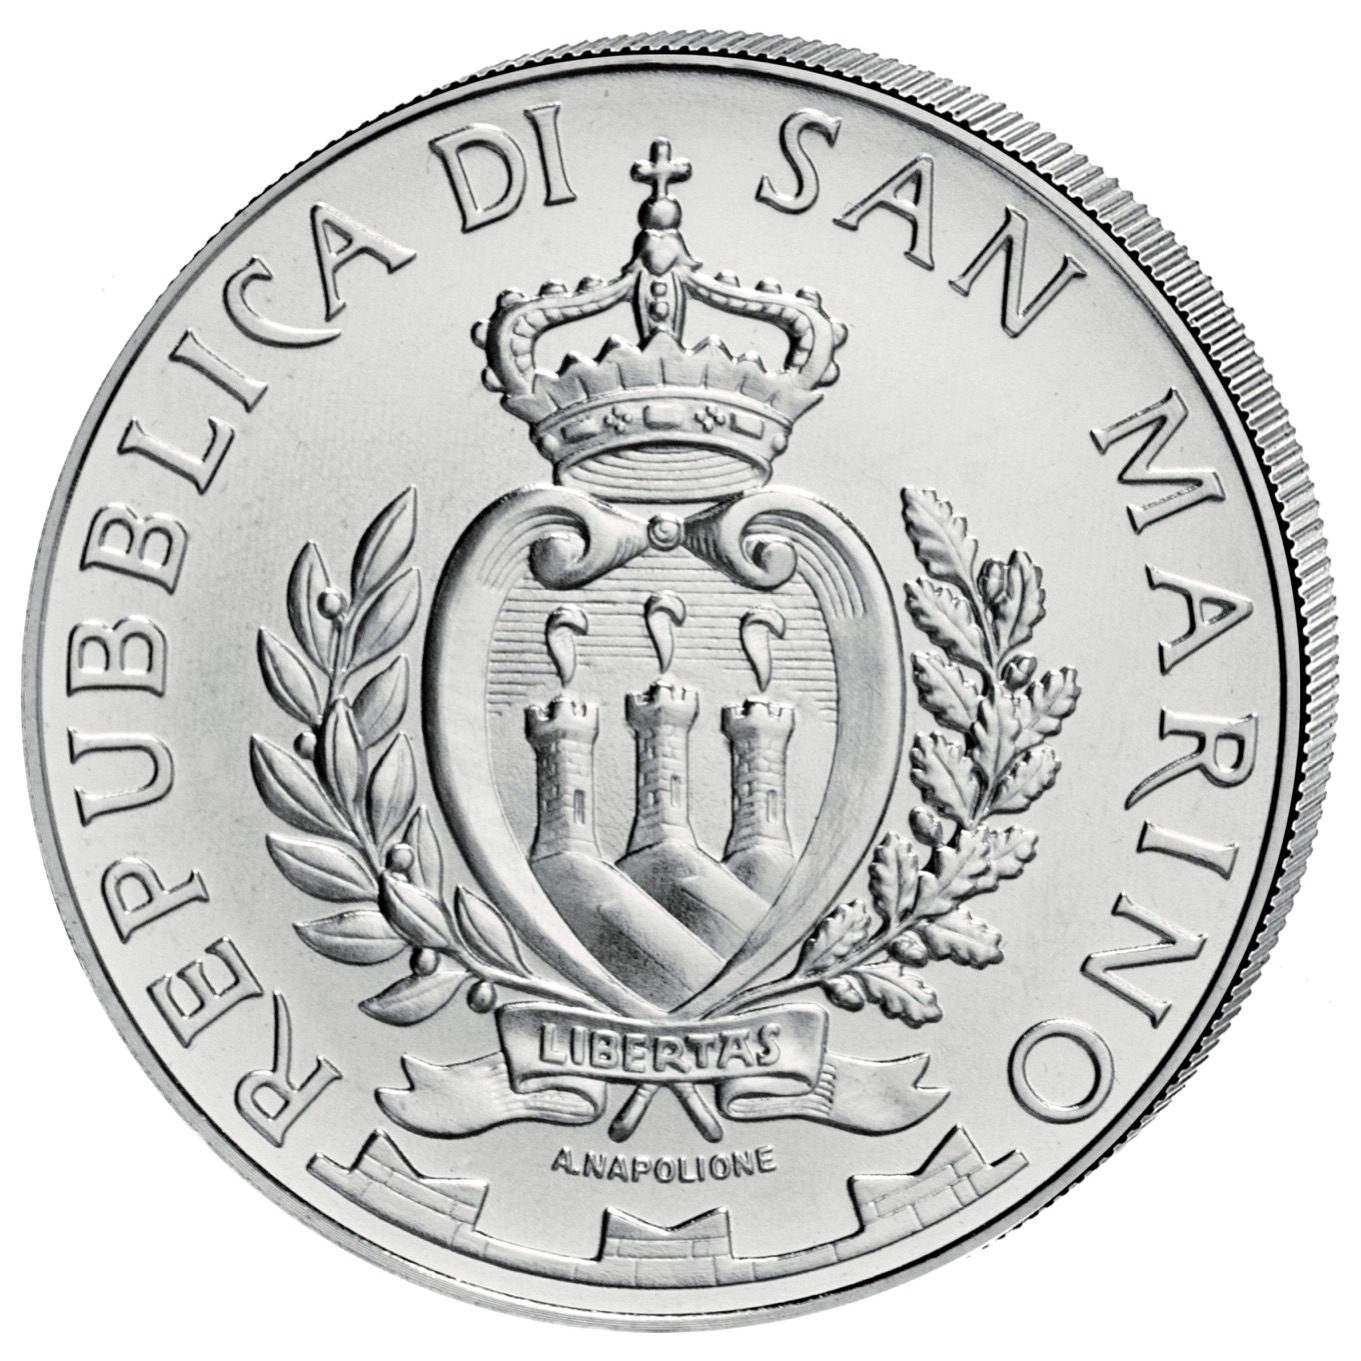 SM 5 Euro 2014 R